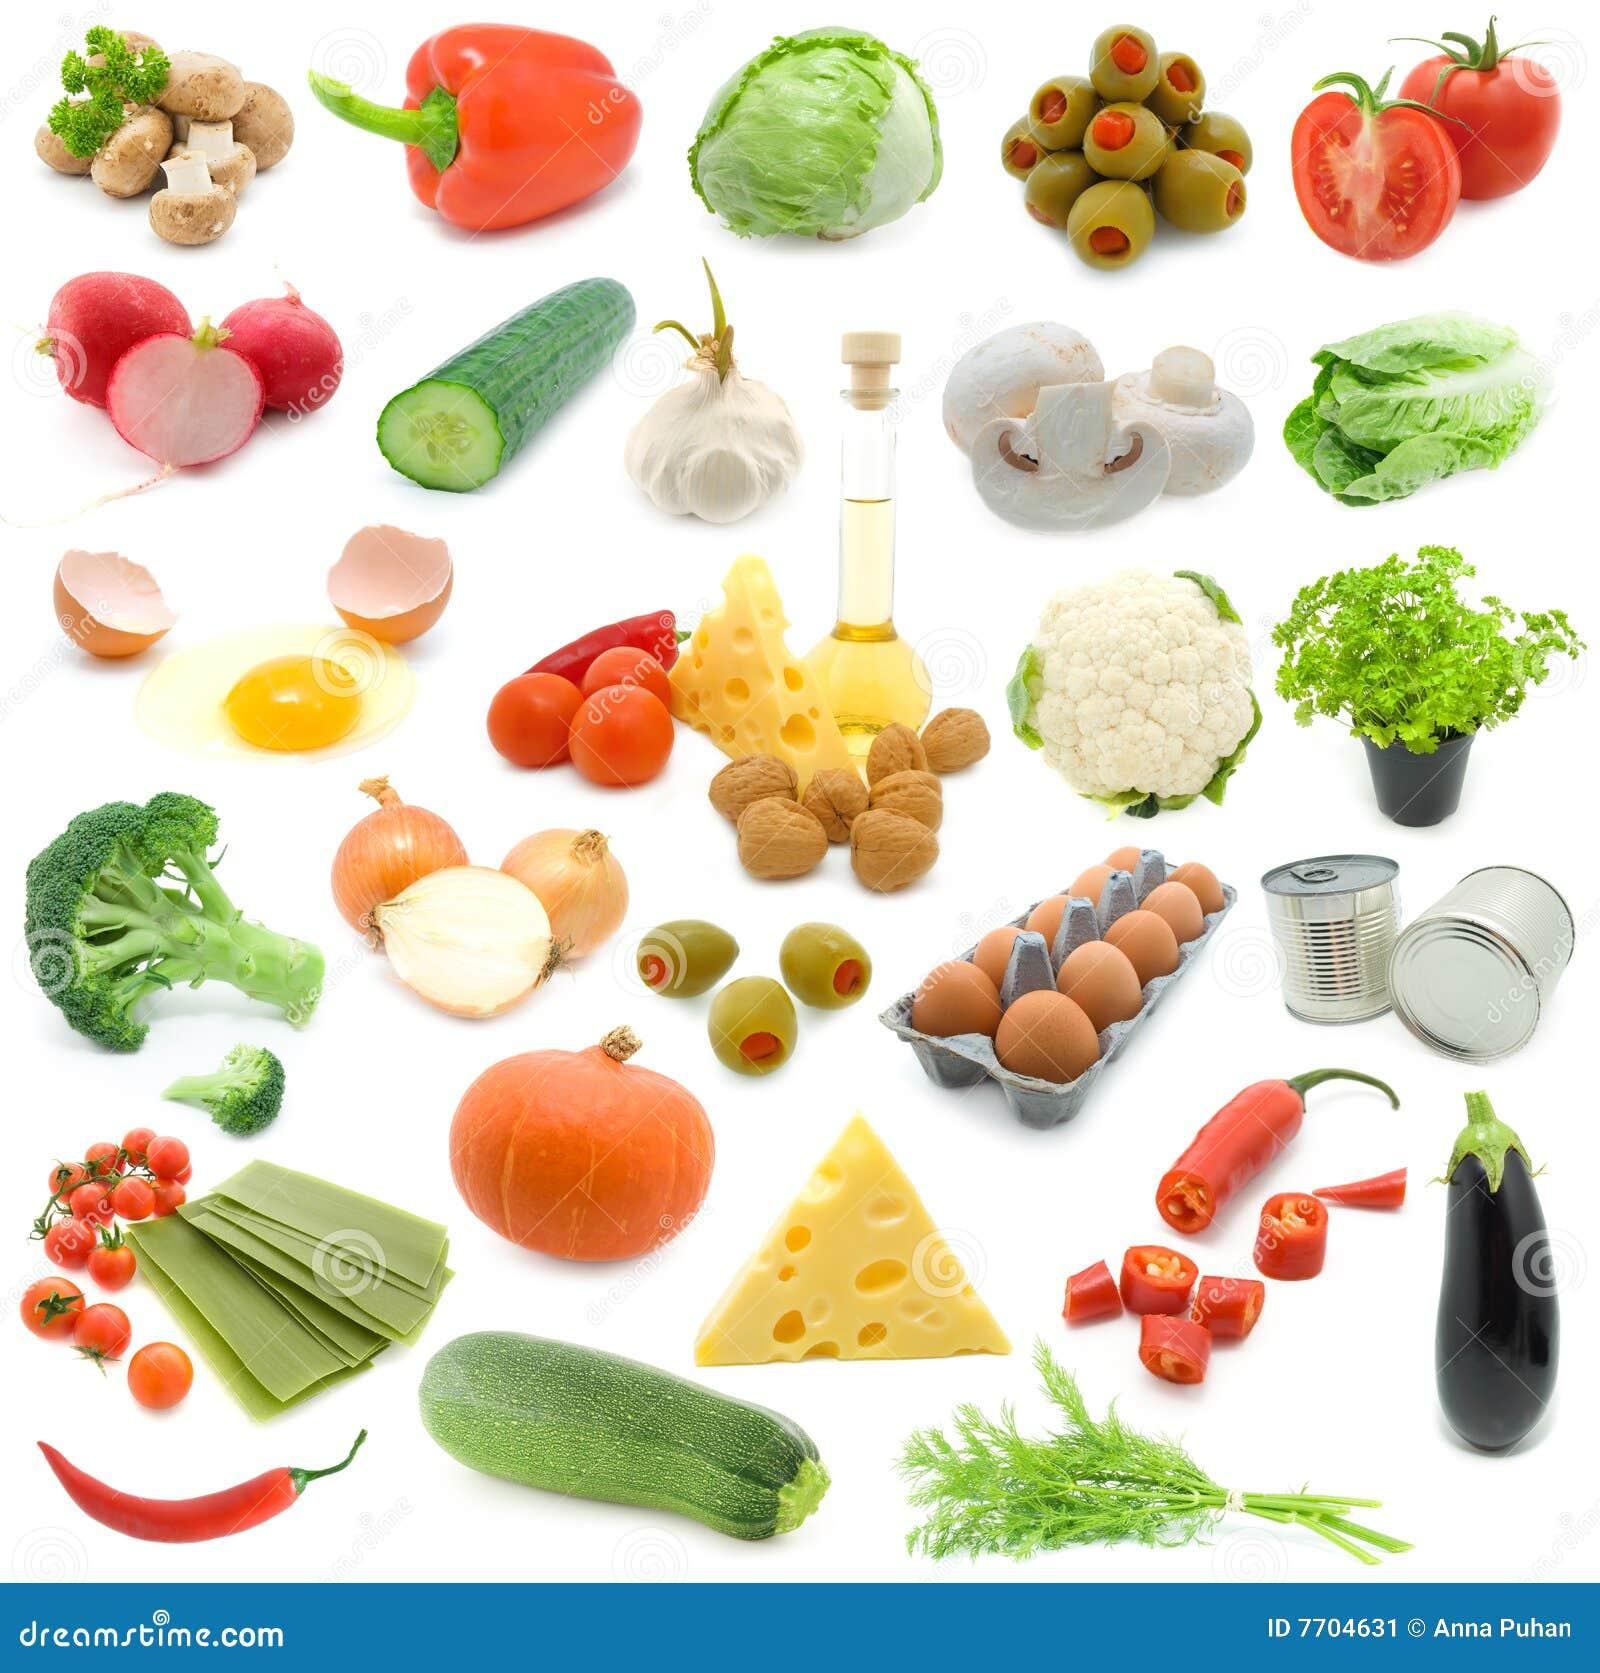 jogo de legumes frescos imagem de stock imagem de flor 7704631. Black Bedroom Furniture Sets. Home Design Ideas